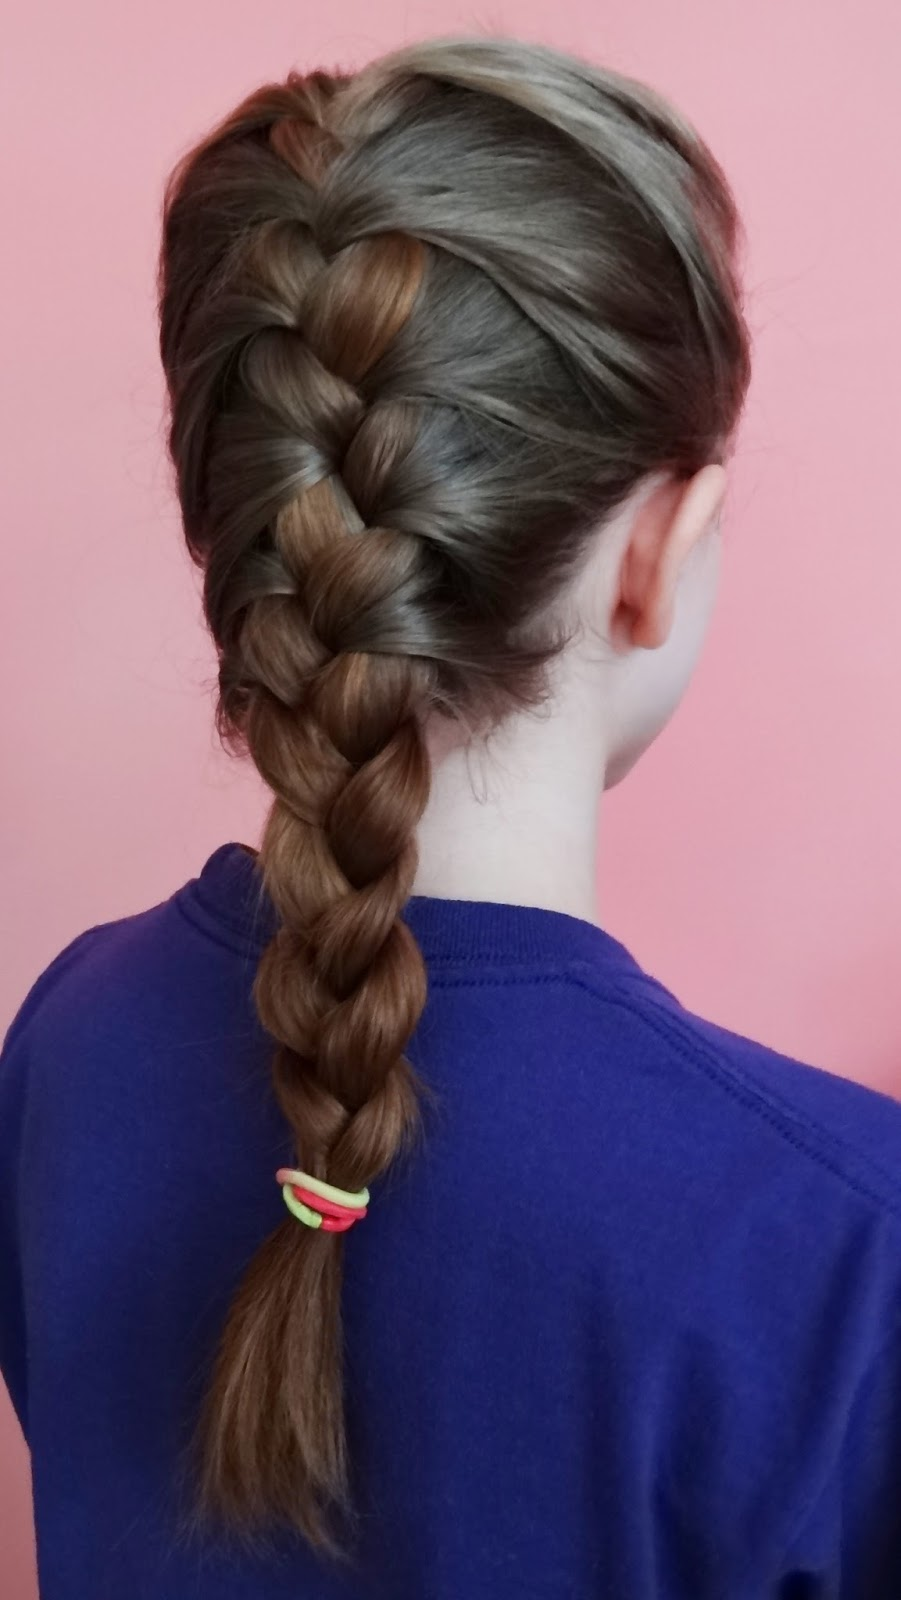 Siap Ke Sekolah dengan Gaya Rambut Trendy yang Simpel  ddc875d2c8